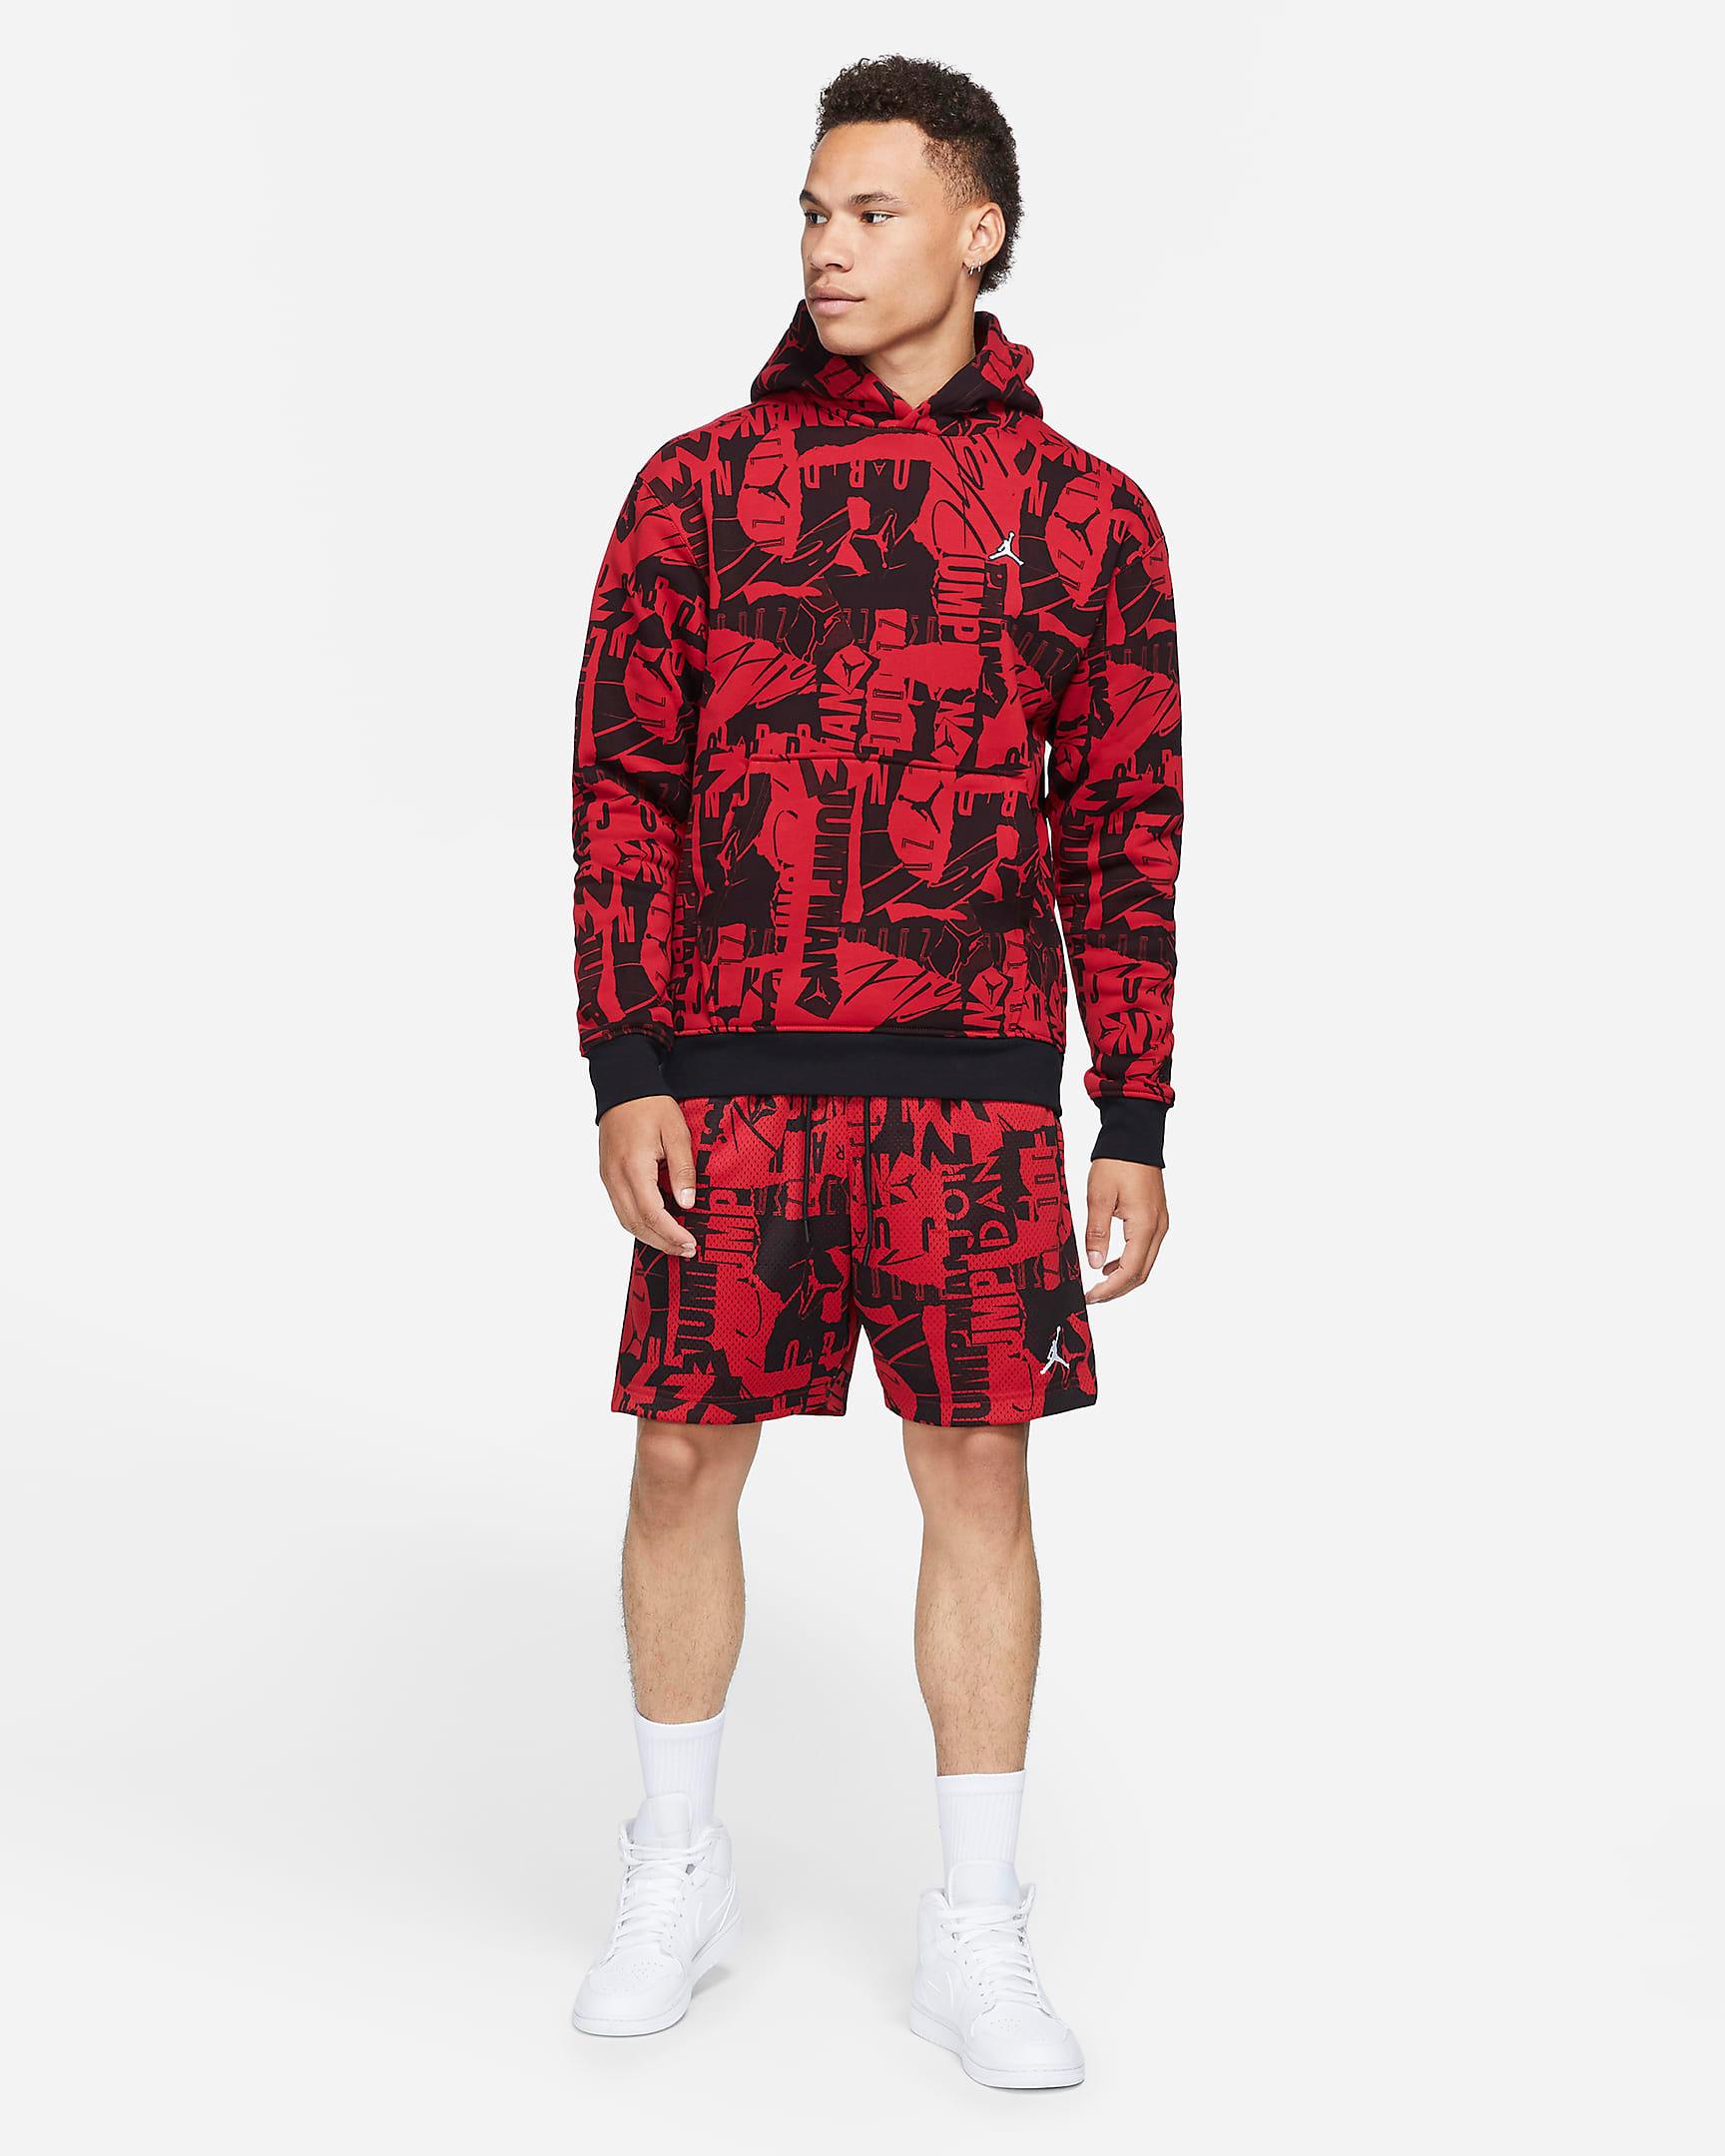 jordan-gym-red-sneaker-outfit